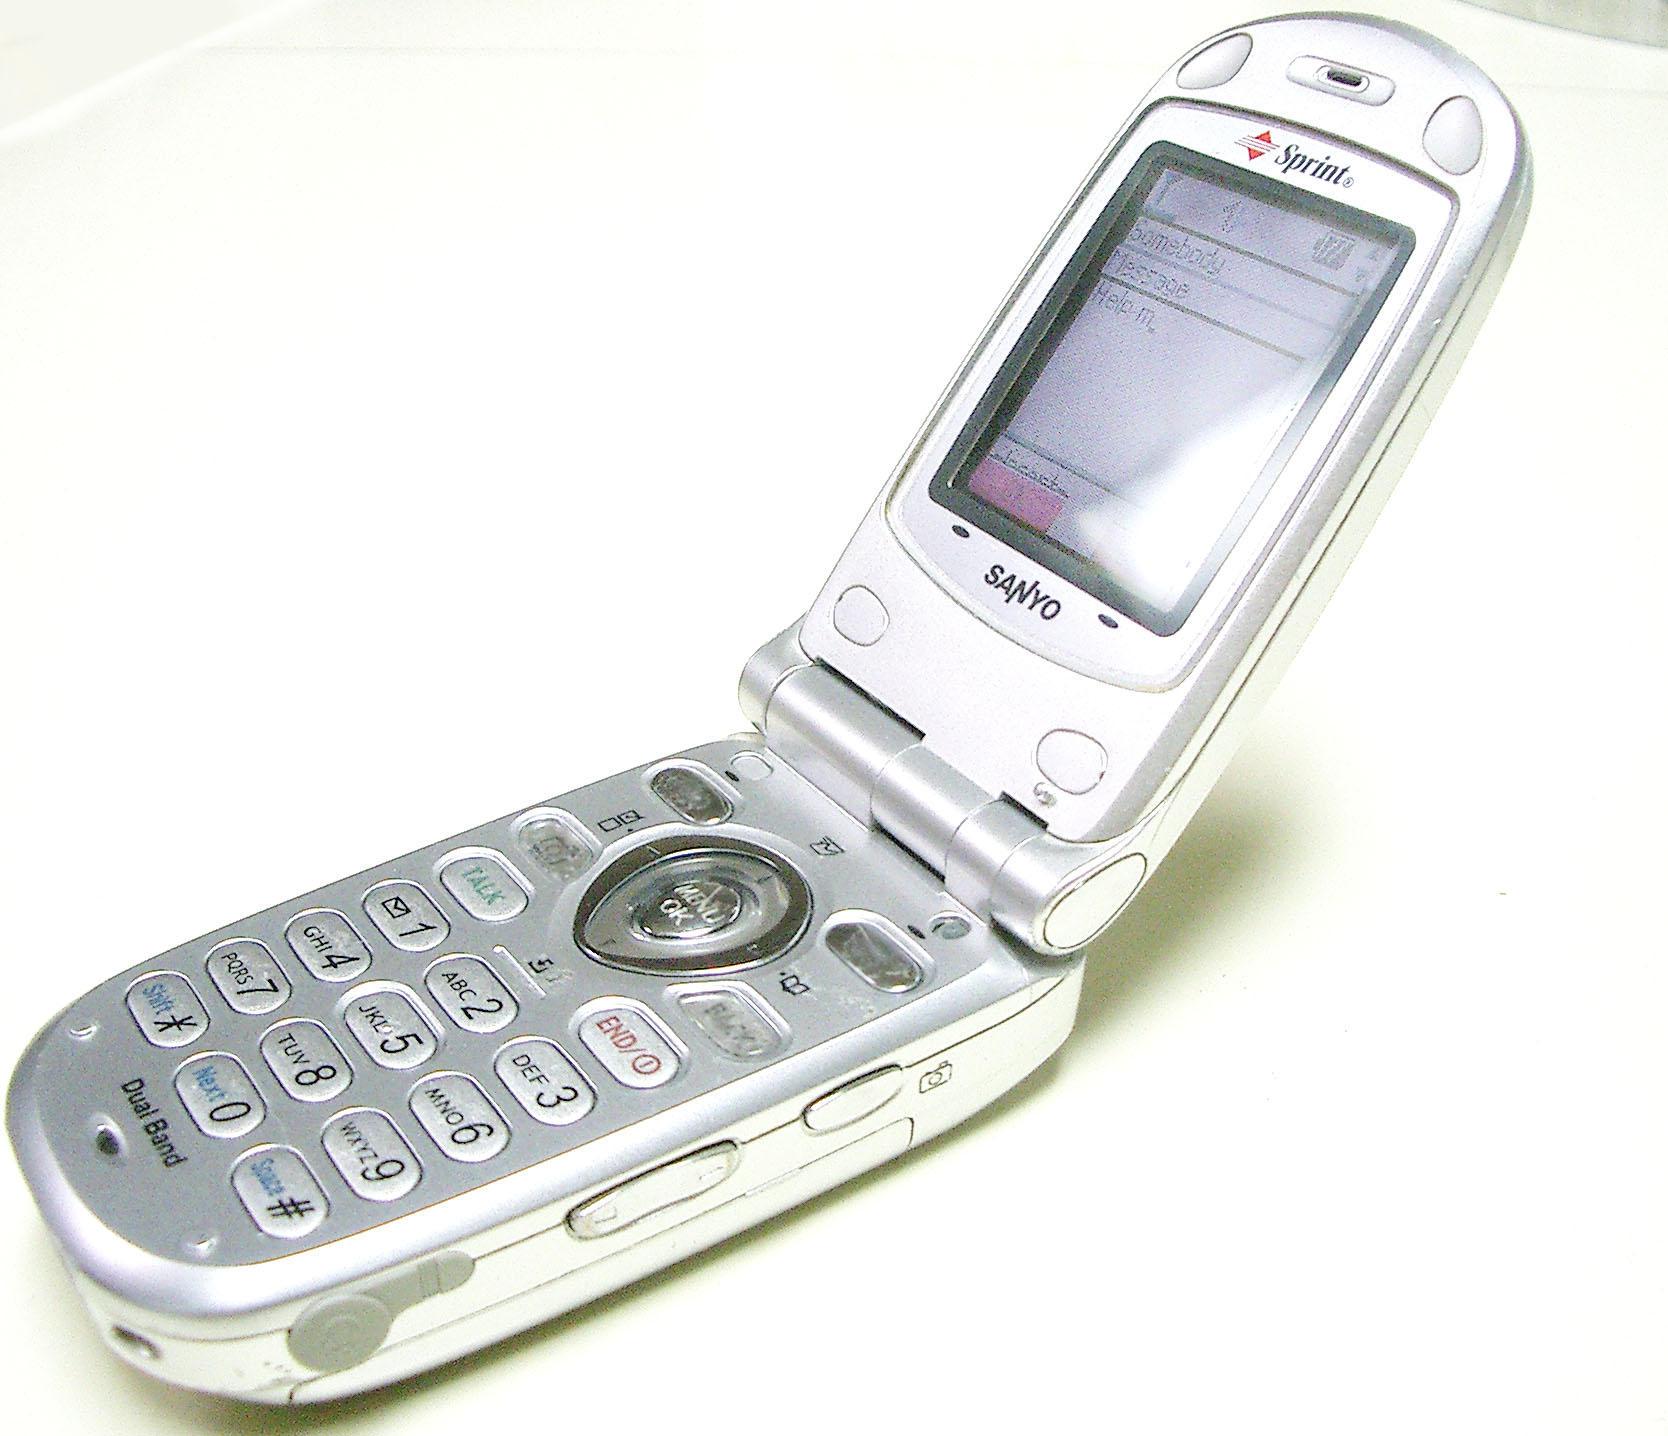 2004 cell phone video soplando 2